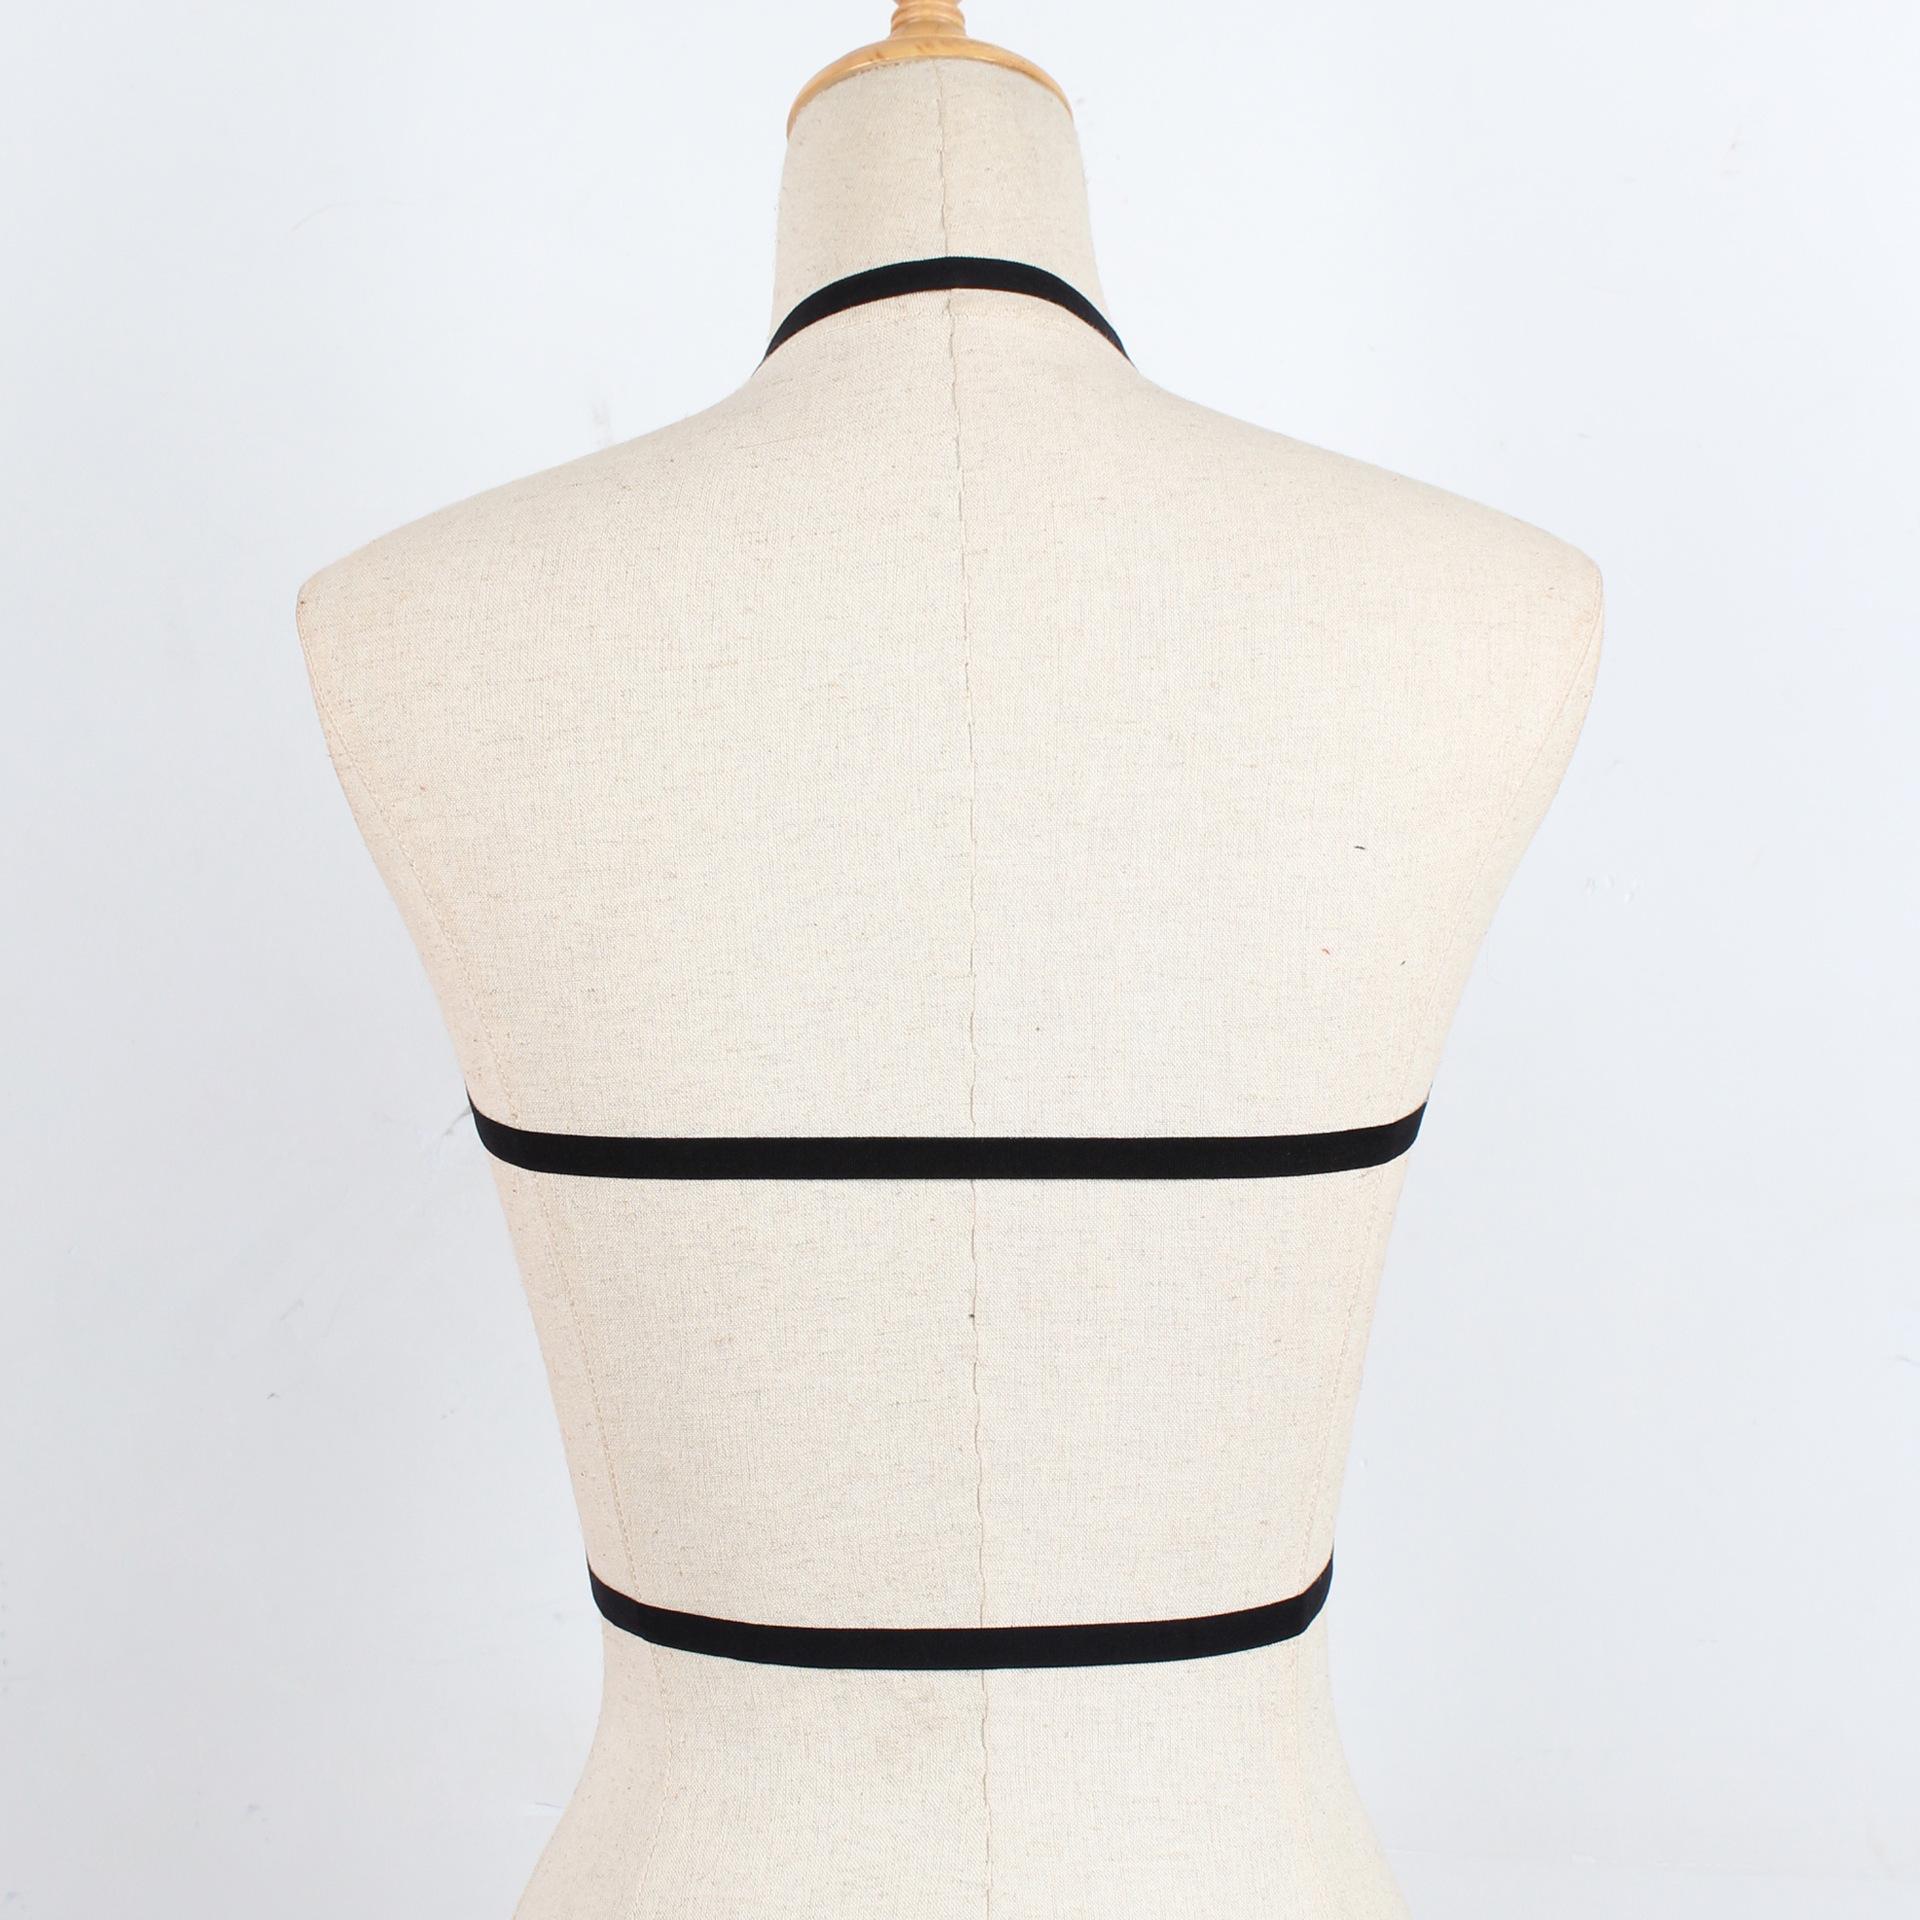 7a12b913ec721 2018 Bra Cage Bandage Harness Lingerie Sexy Women Body Harness ...